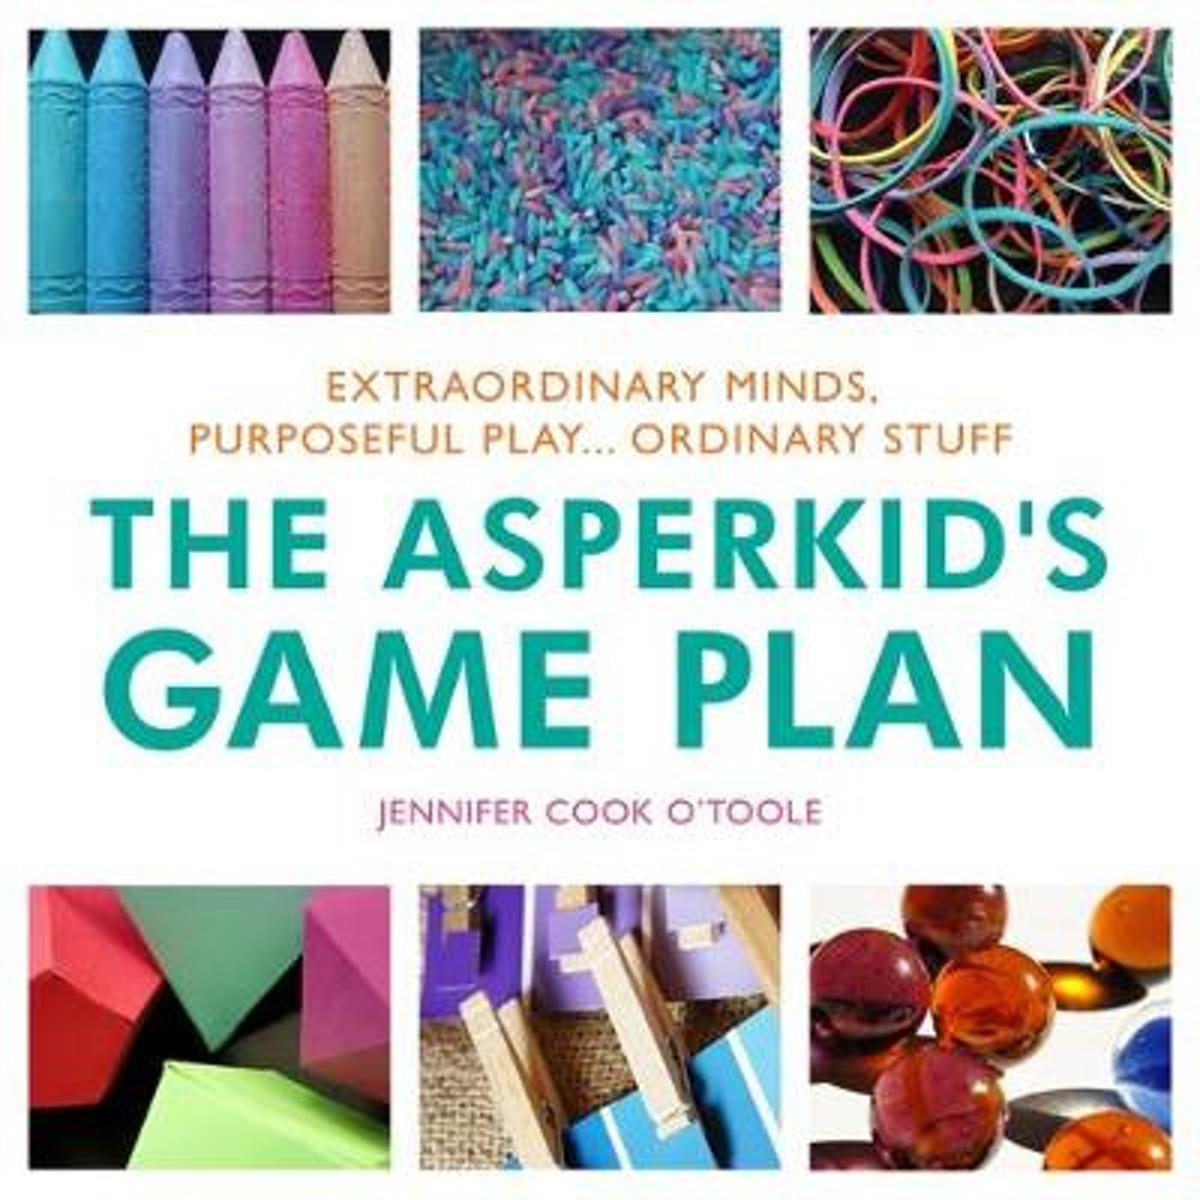 bol.com | The Asperkid's Game Plan | 9781849059596 | Jennifer Cook O'Toole  | Boeken